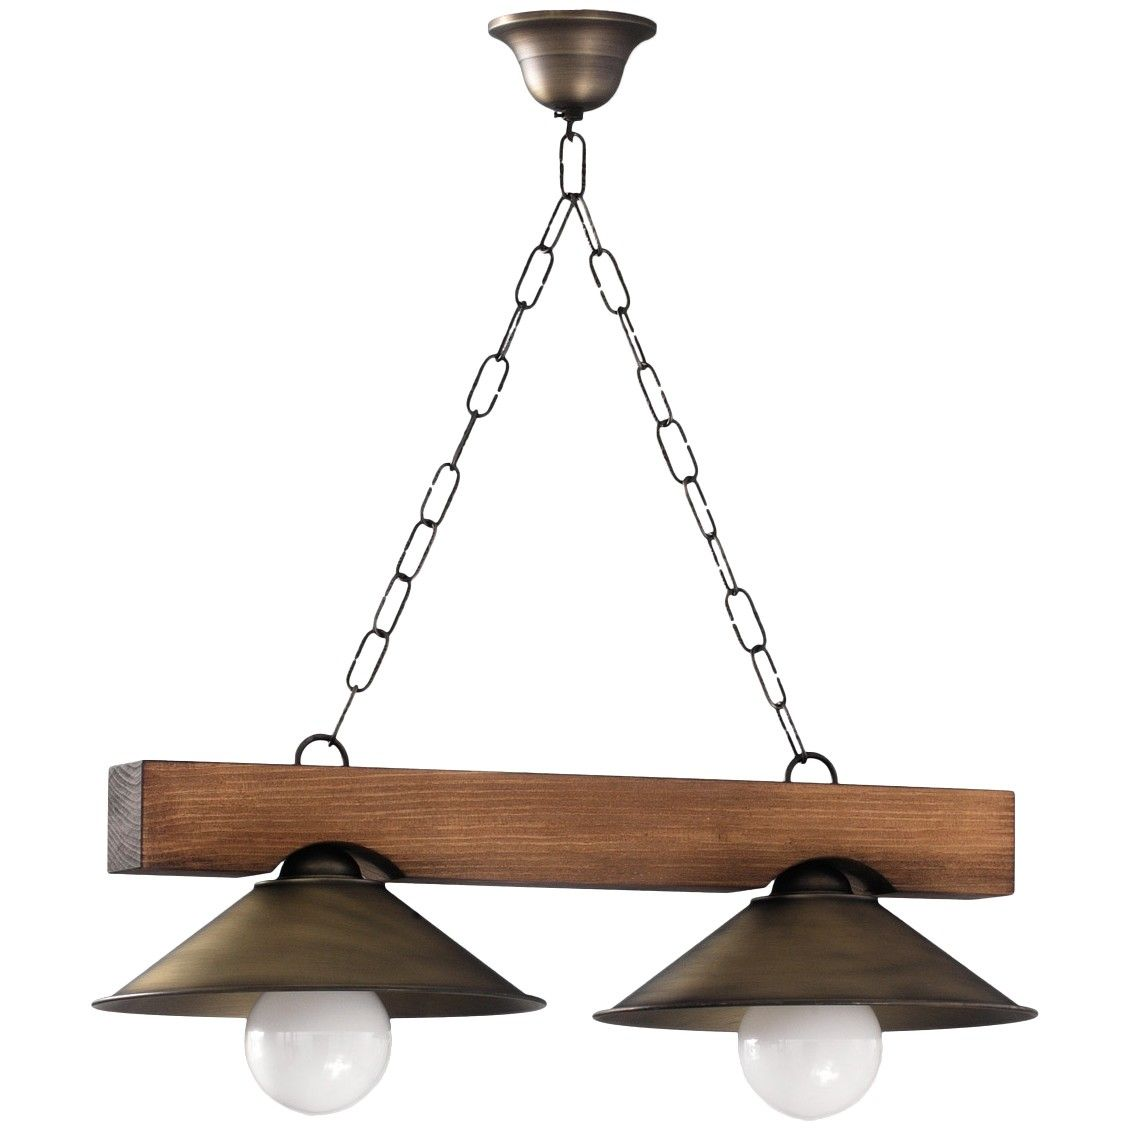 L mpara de techo r stica viga de madera 2 luces - Lampara de techo de madera ...